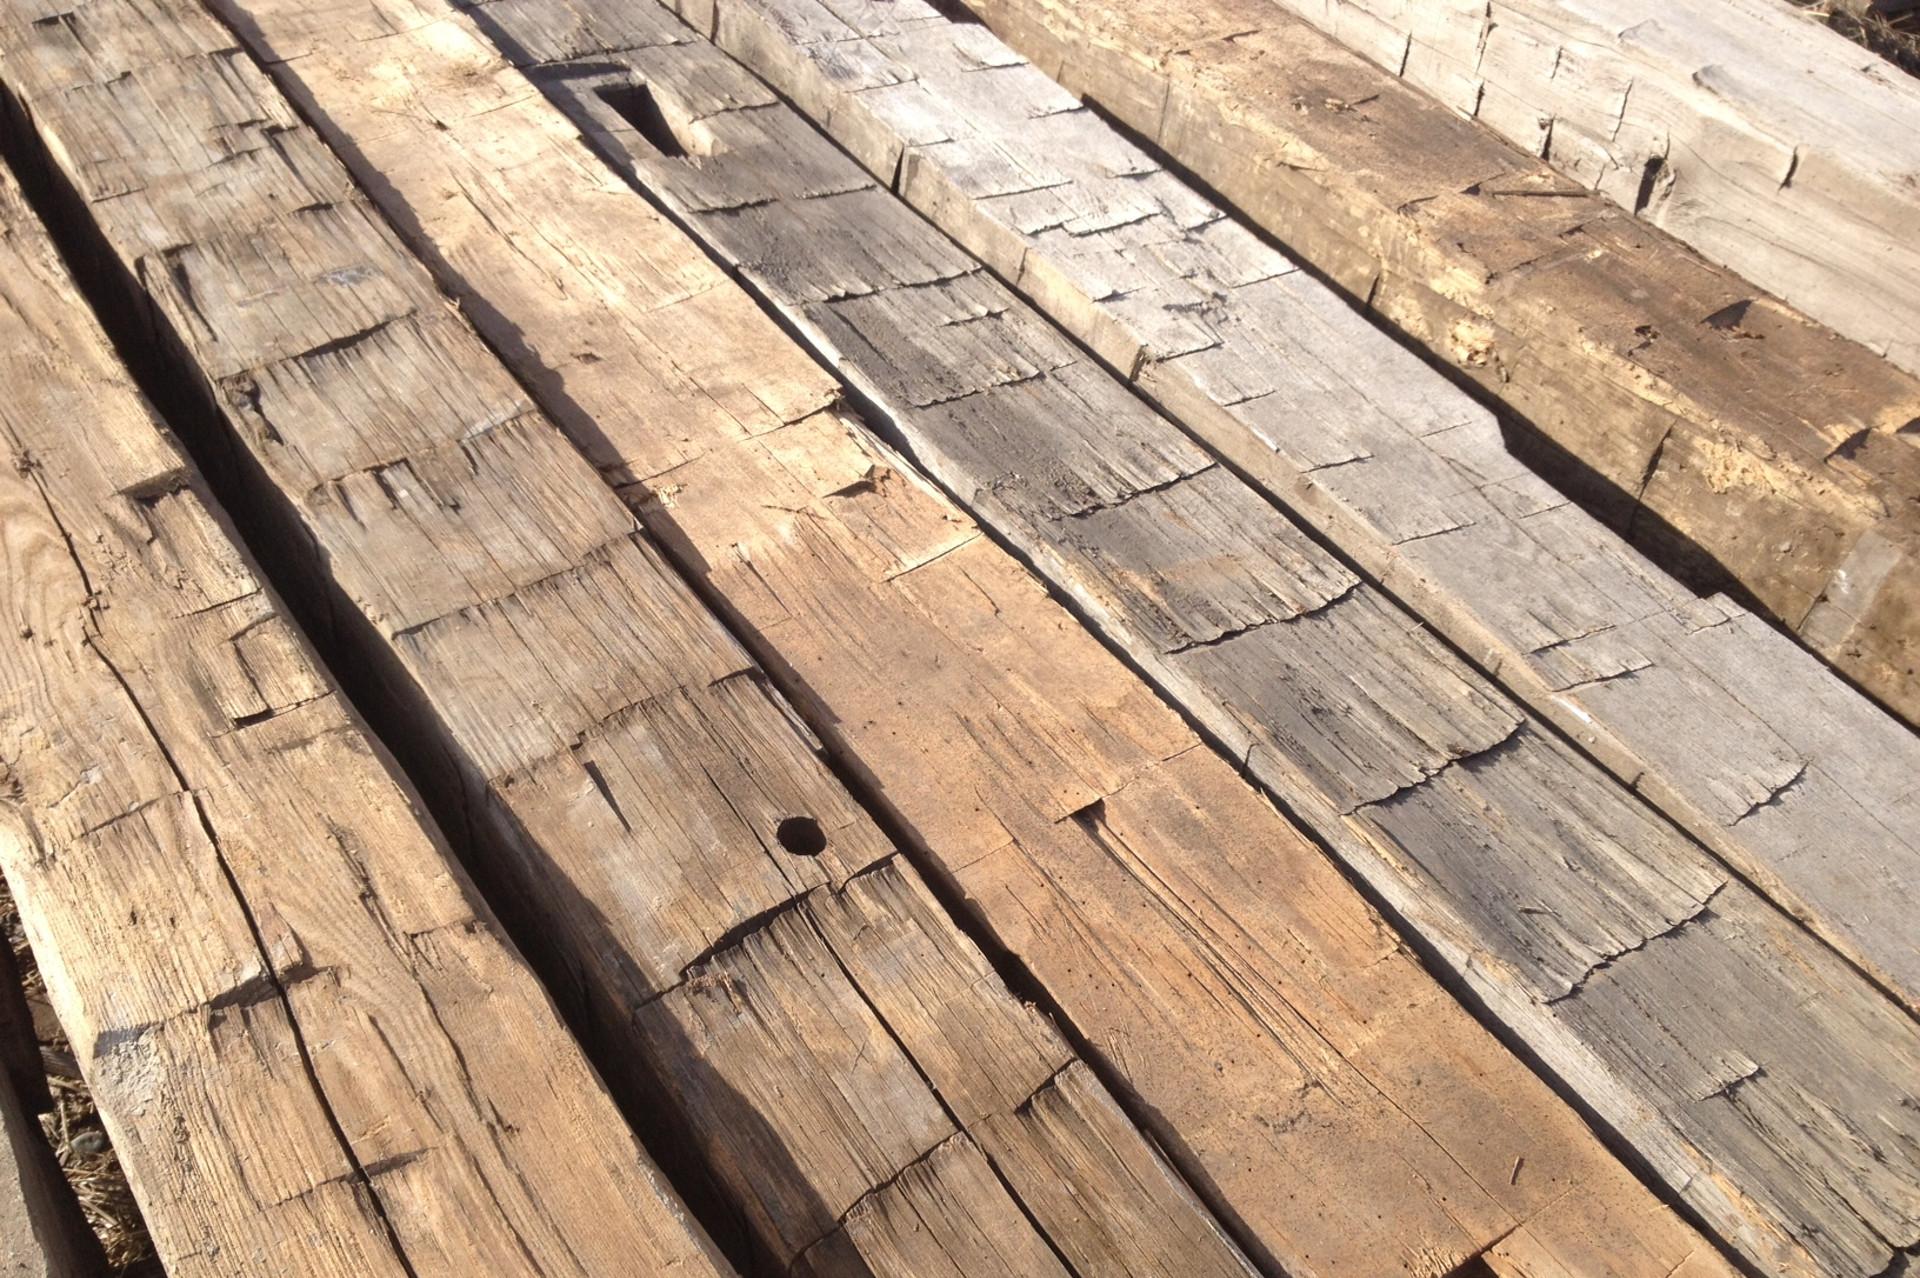 Montana Reclaimed Wood & Lumber | Rustic Wood Hub ...